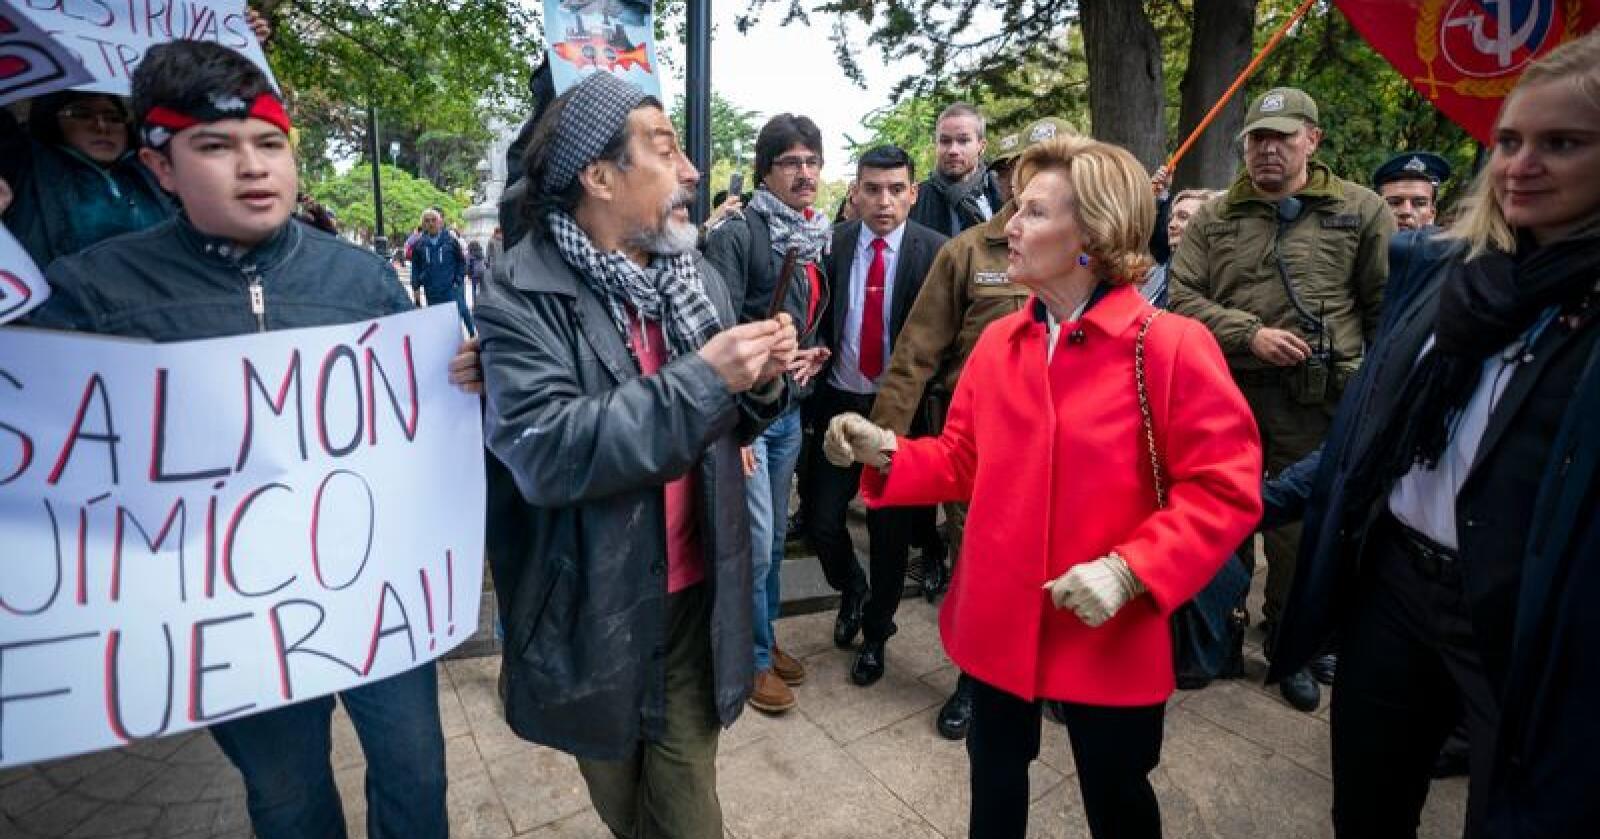 Det oppstod kaos då demonstrantar blokkerte for kong Harald og dronning Sonja på eit torg i den vesle byen Punta Arenas i Chile. Foto: Heiko Junge / NTB scanpix / NPK